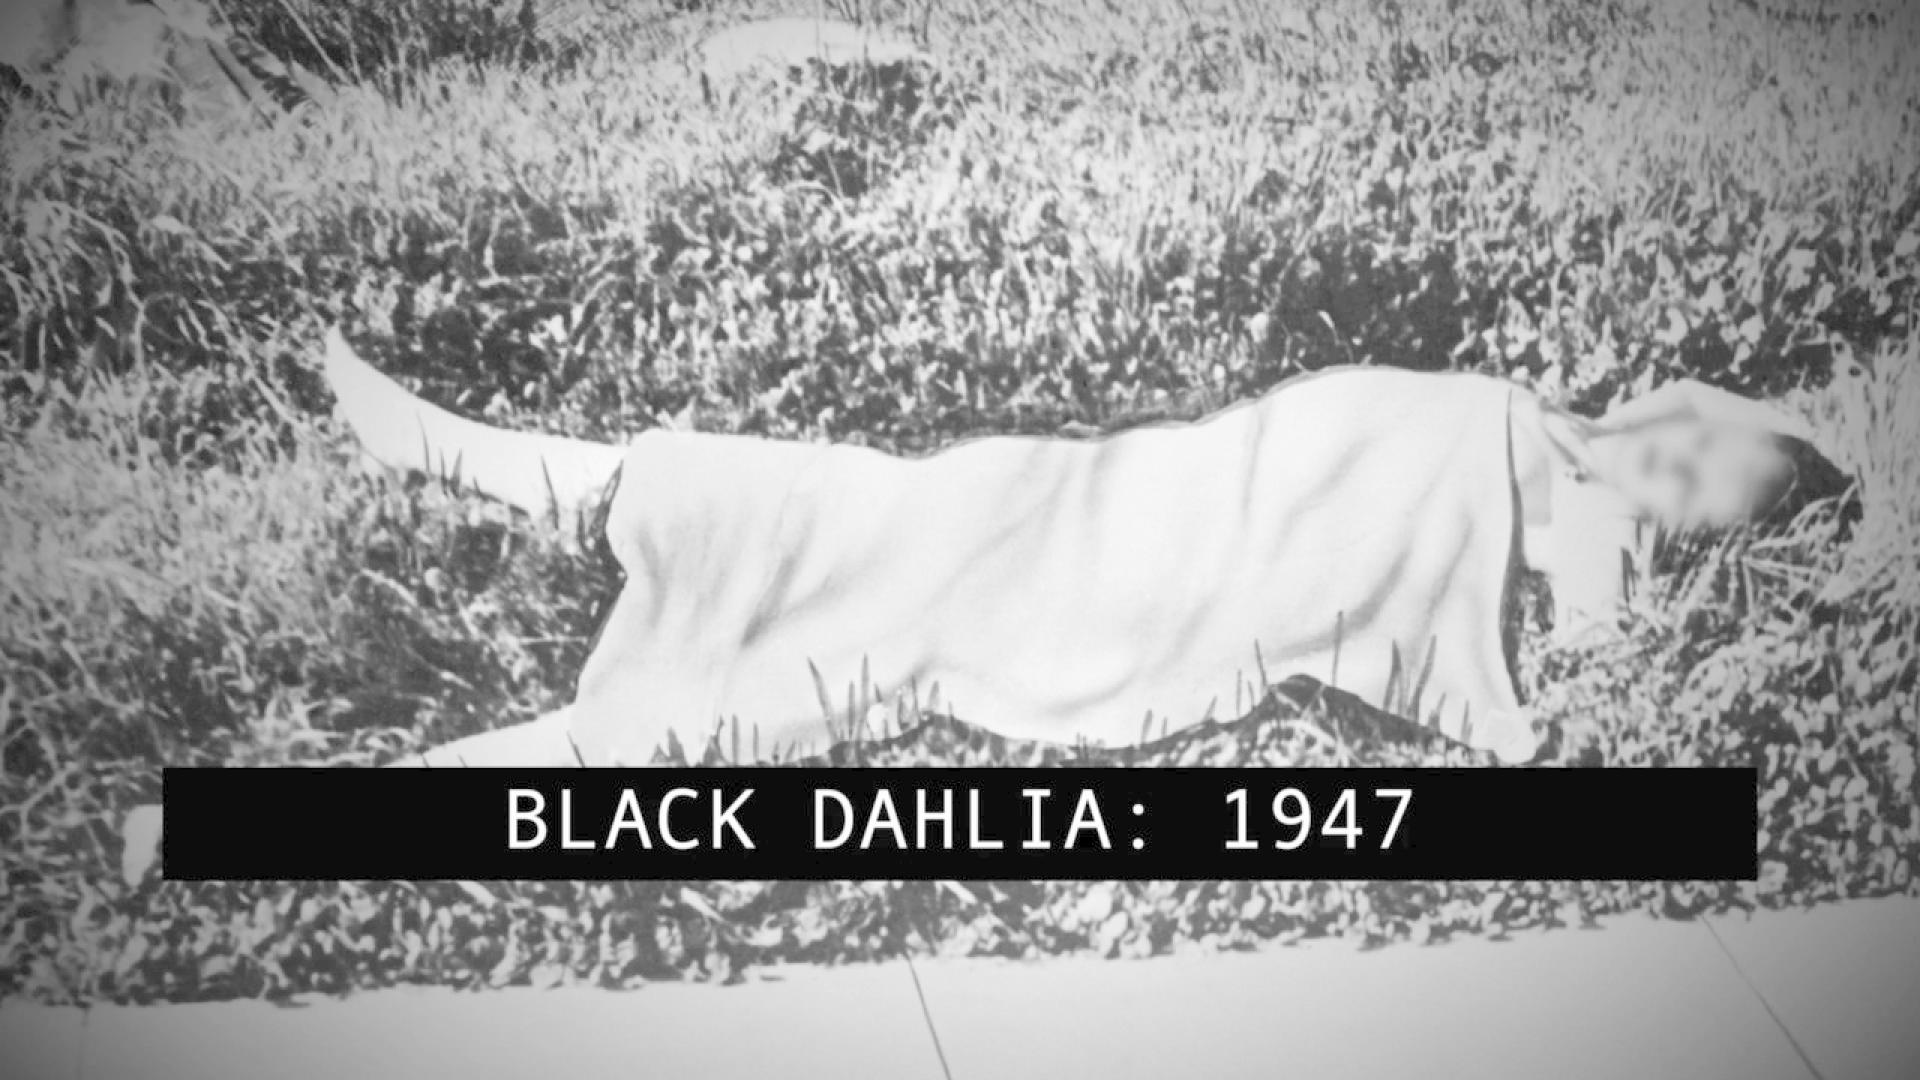 rejtelyek_black_dahlia_murder_2_kep